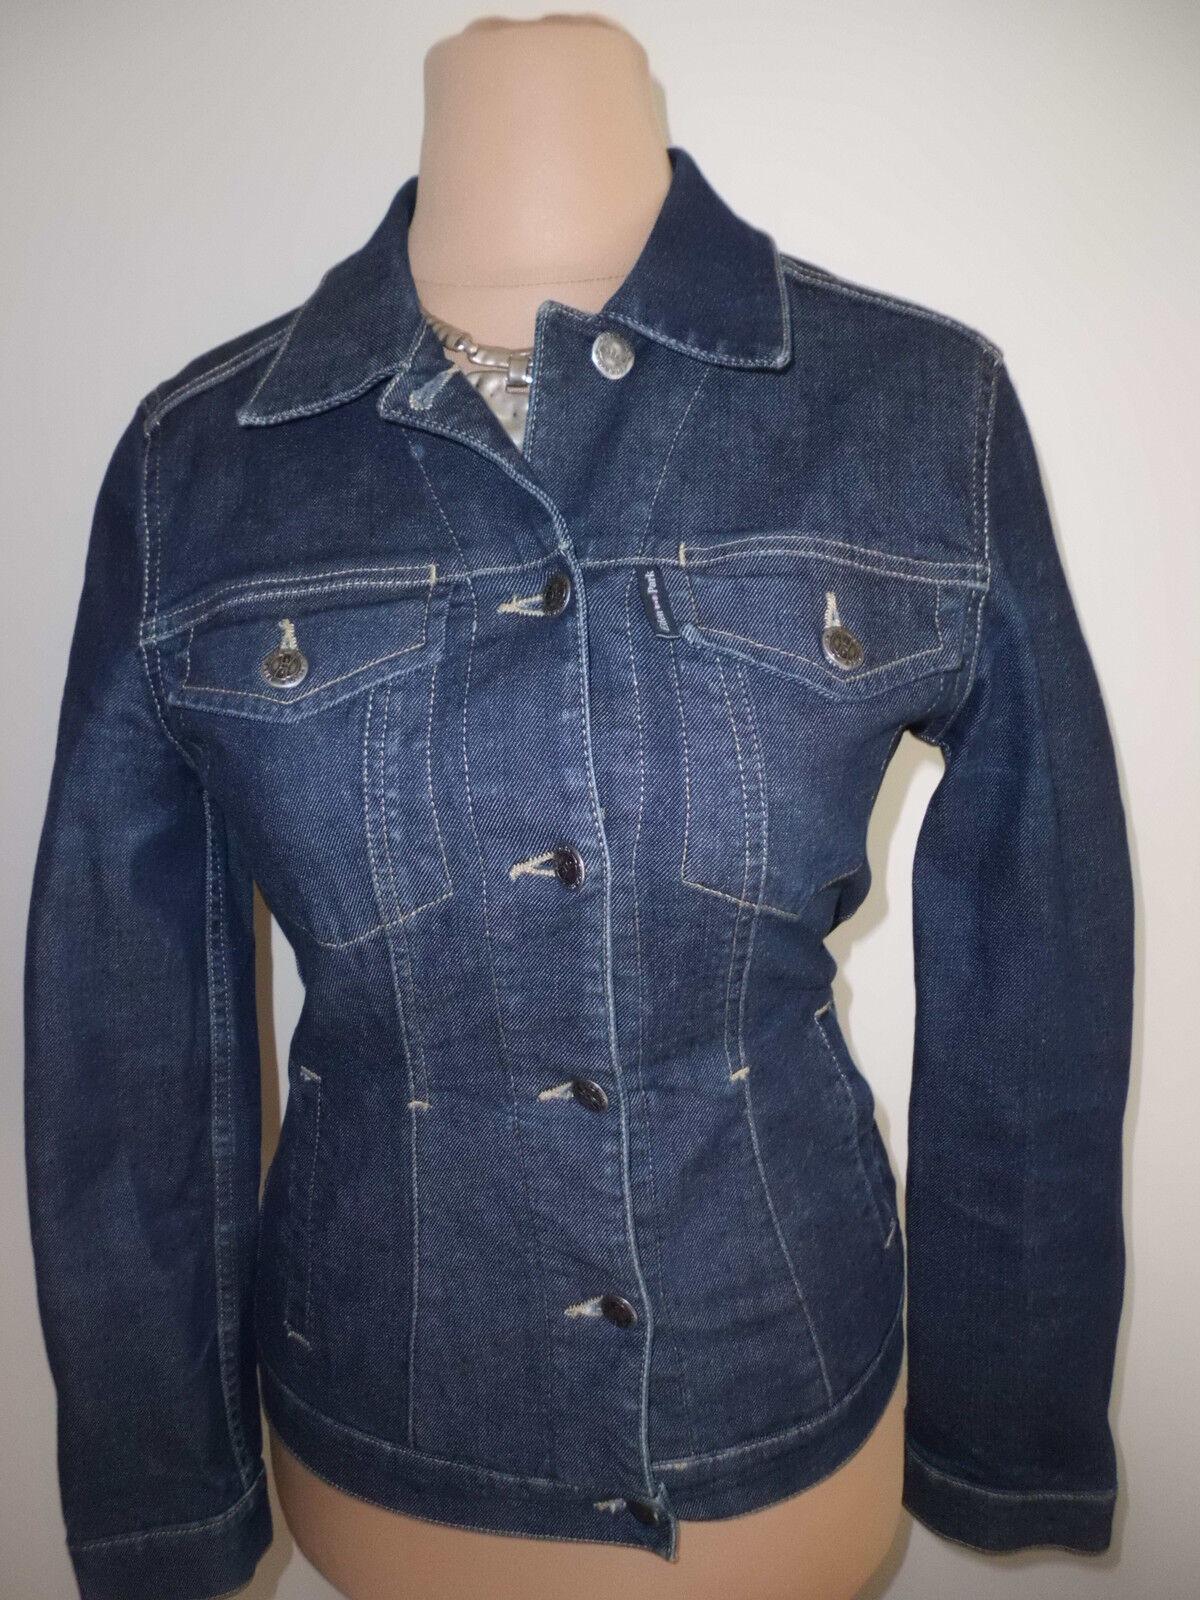 Giacca di jeans Eden Park Formato blue 38 à -71%